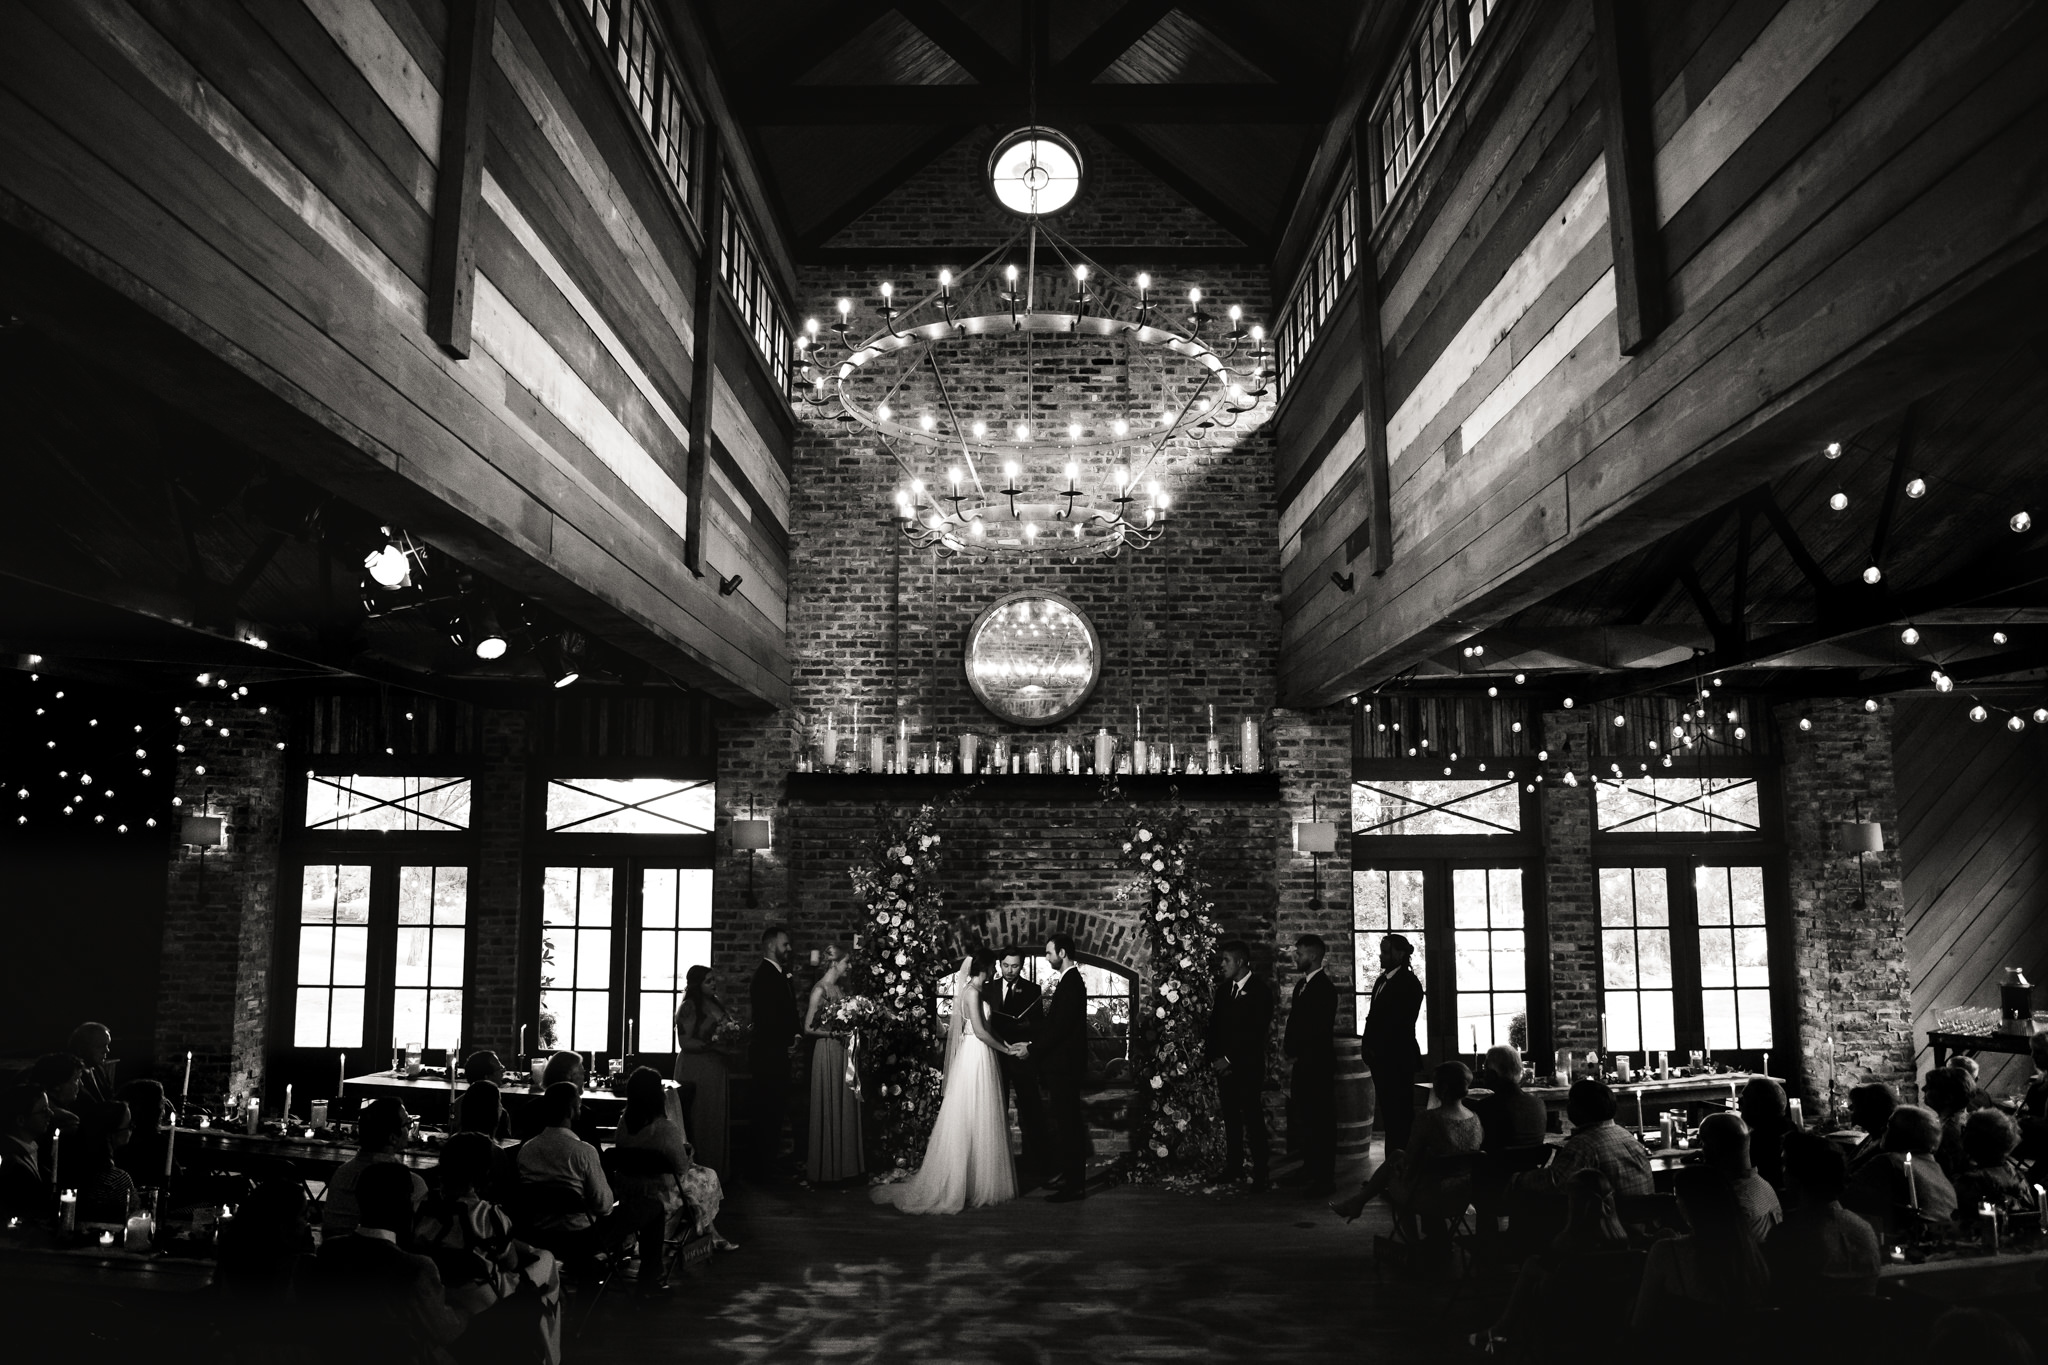 phantom-canyon-brewery-colorado-springs-wedding-photographer-393.jpg